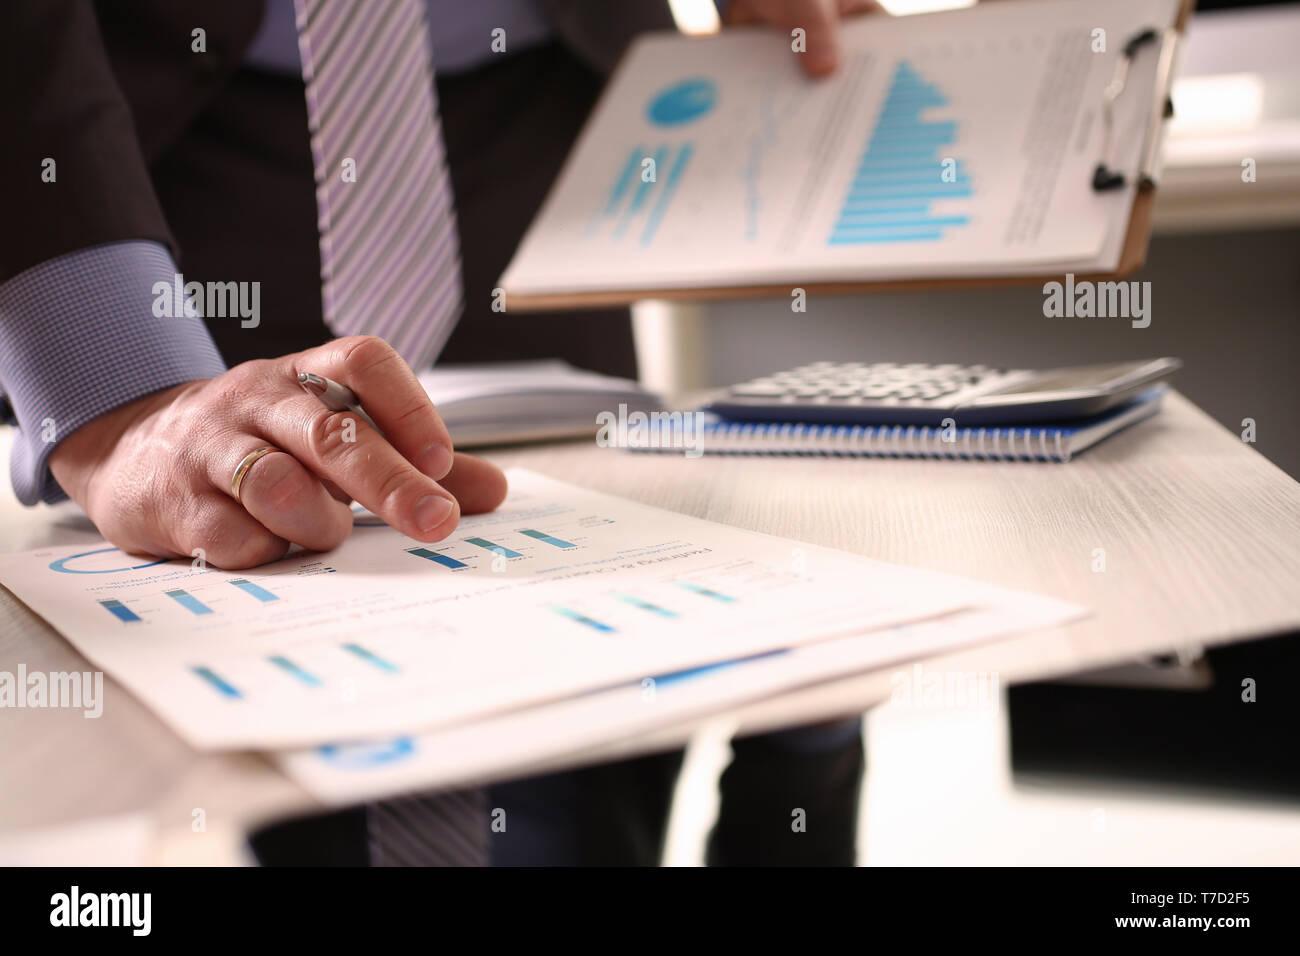 Accountant Calculate Tax Invoice Using Calculator - Stock Image